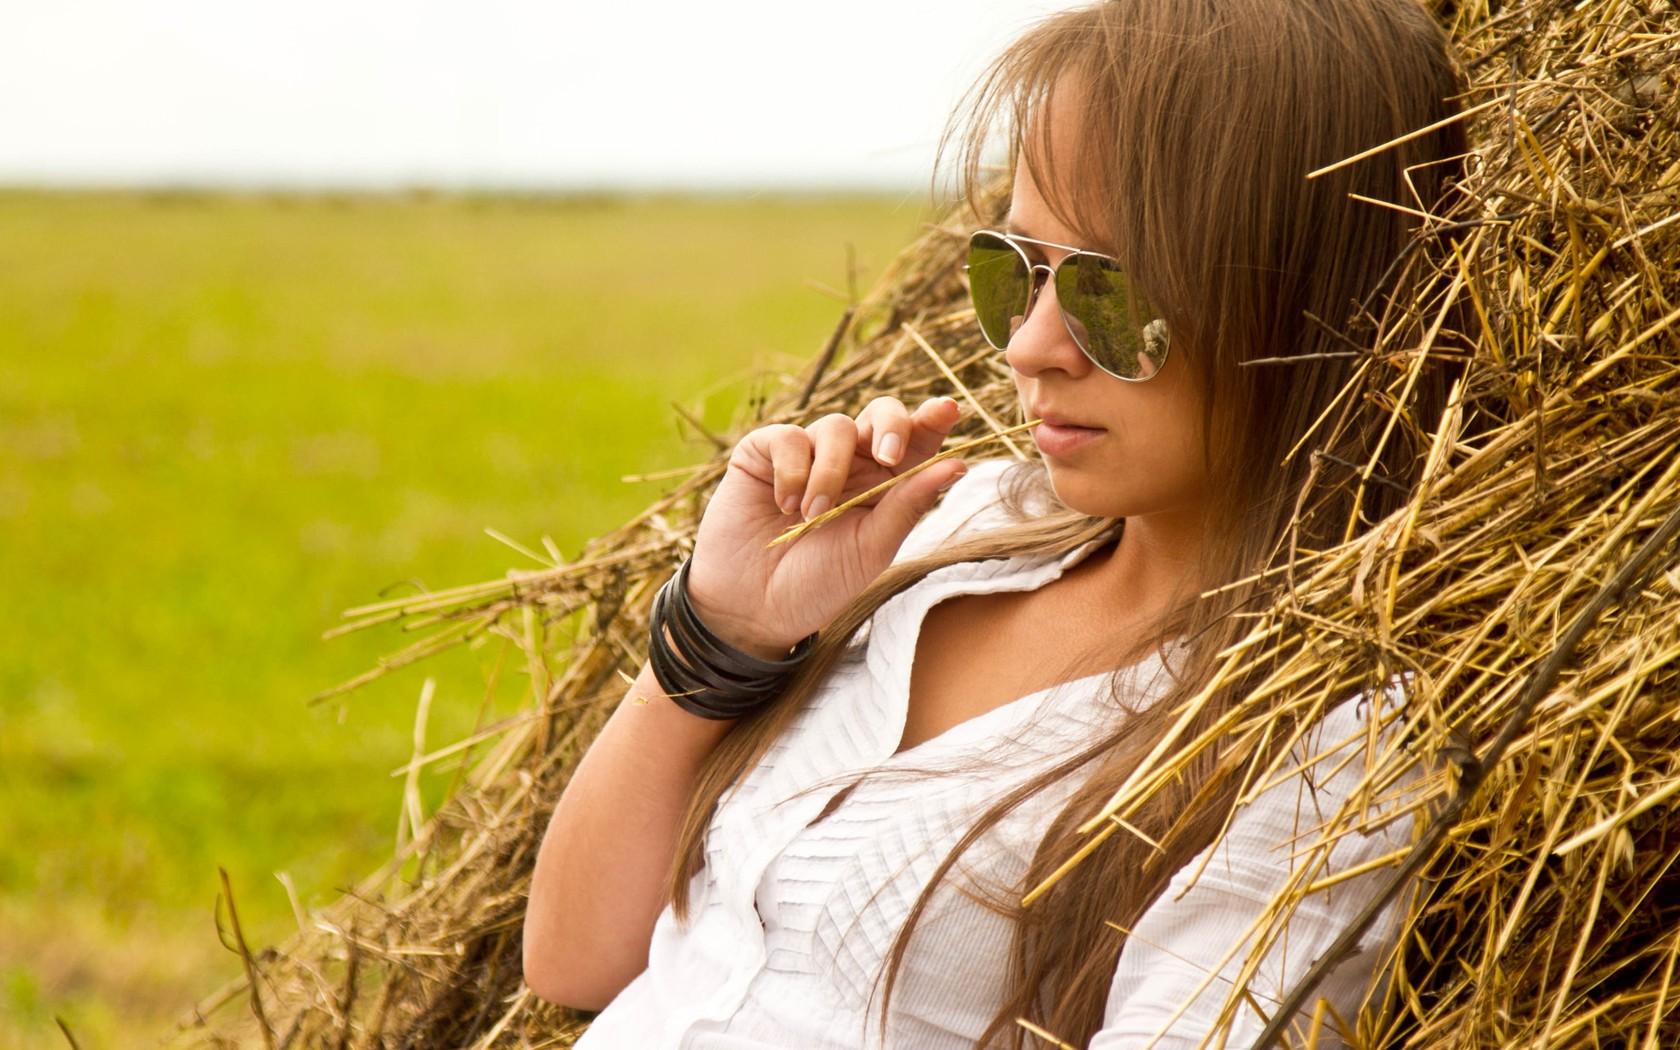 Фото девушки летом на отдыхе в деревне